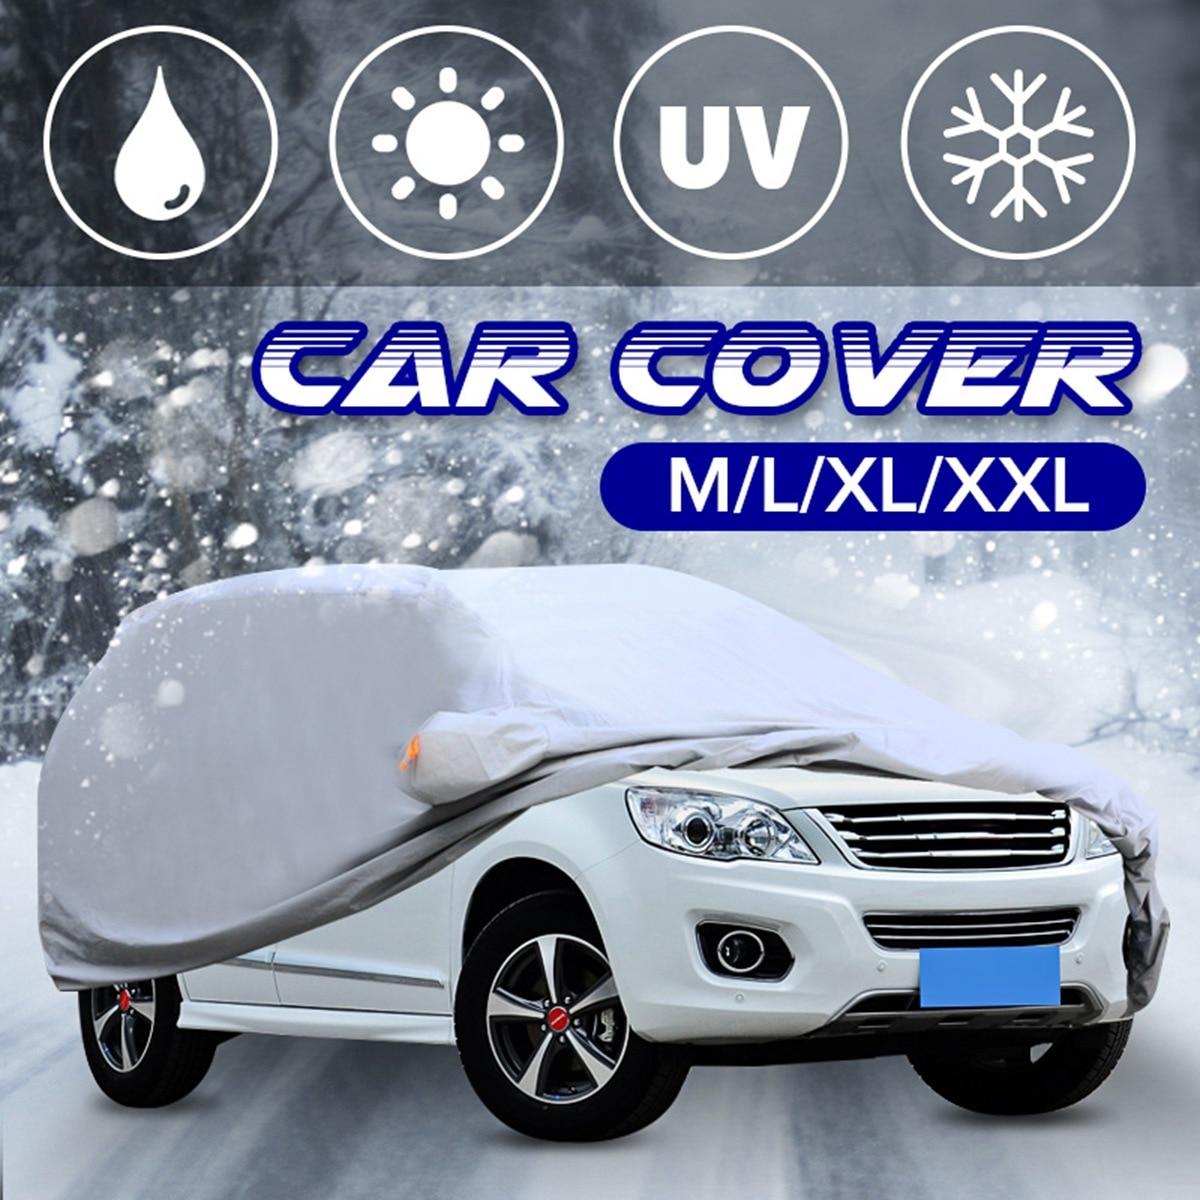 Universal 4 Size M L XL XXL Silver Full Car Cover Anti UV Rain Styling Sunshade Heat Protection Dustproof Outdoor